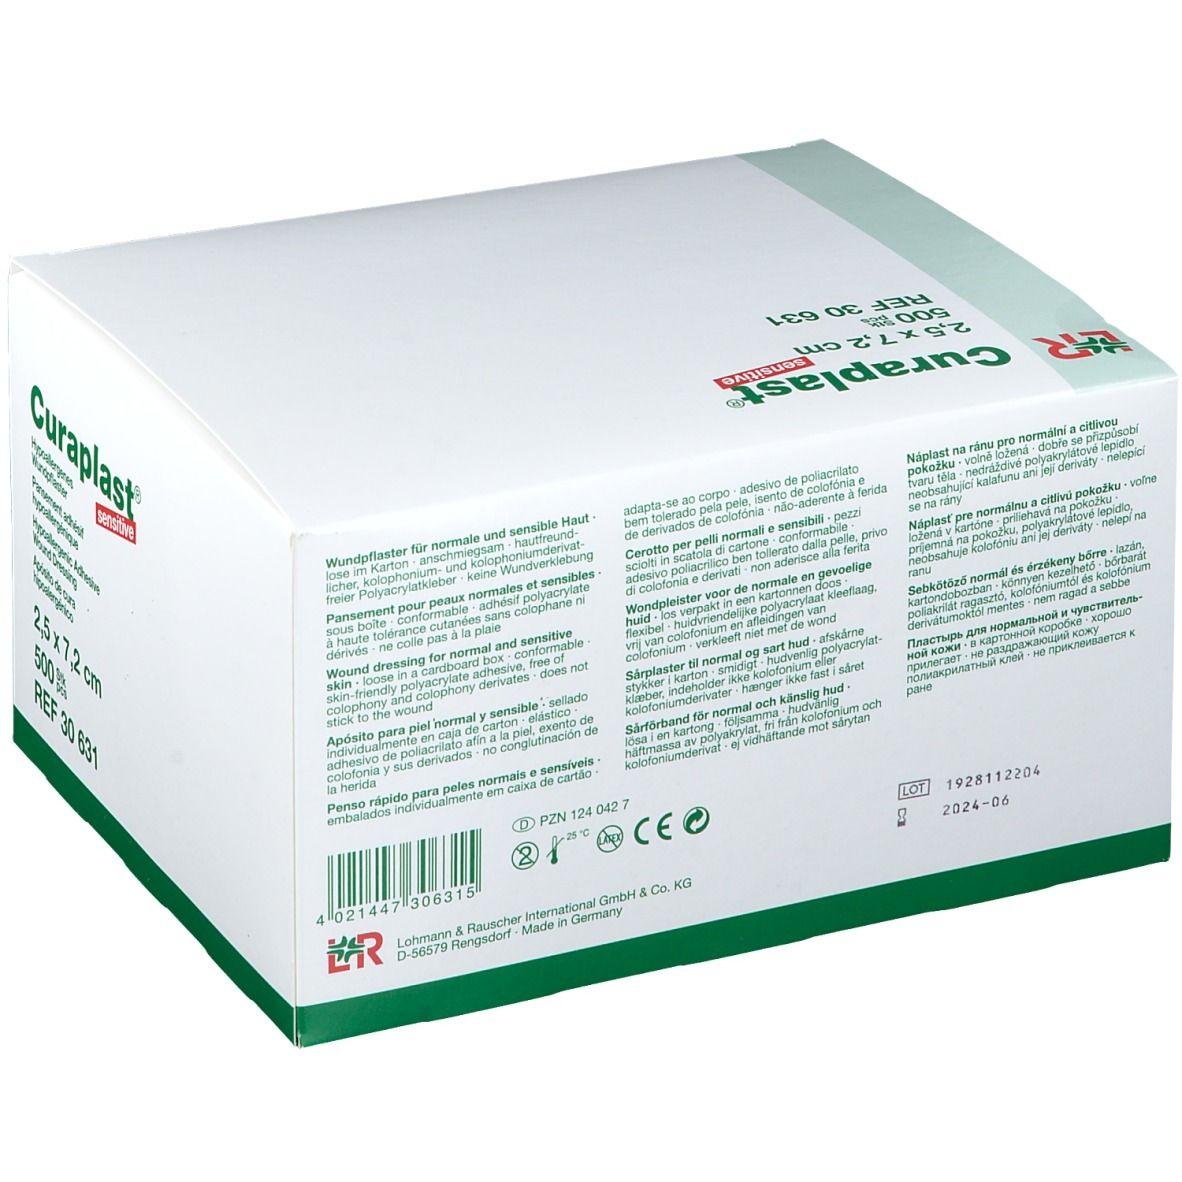 Curaplast® sensitiv strips 2,5 cm x 7,2 cm